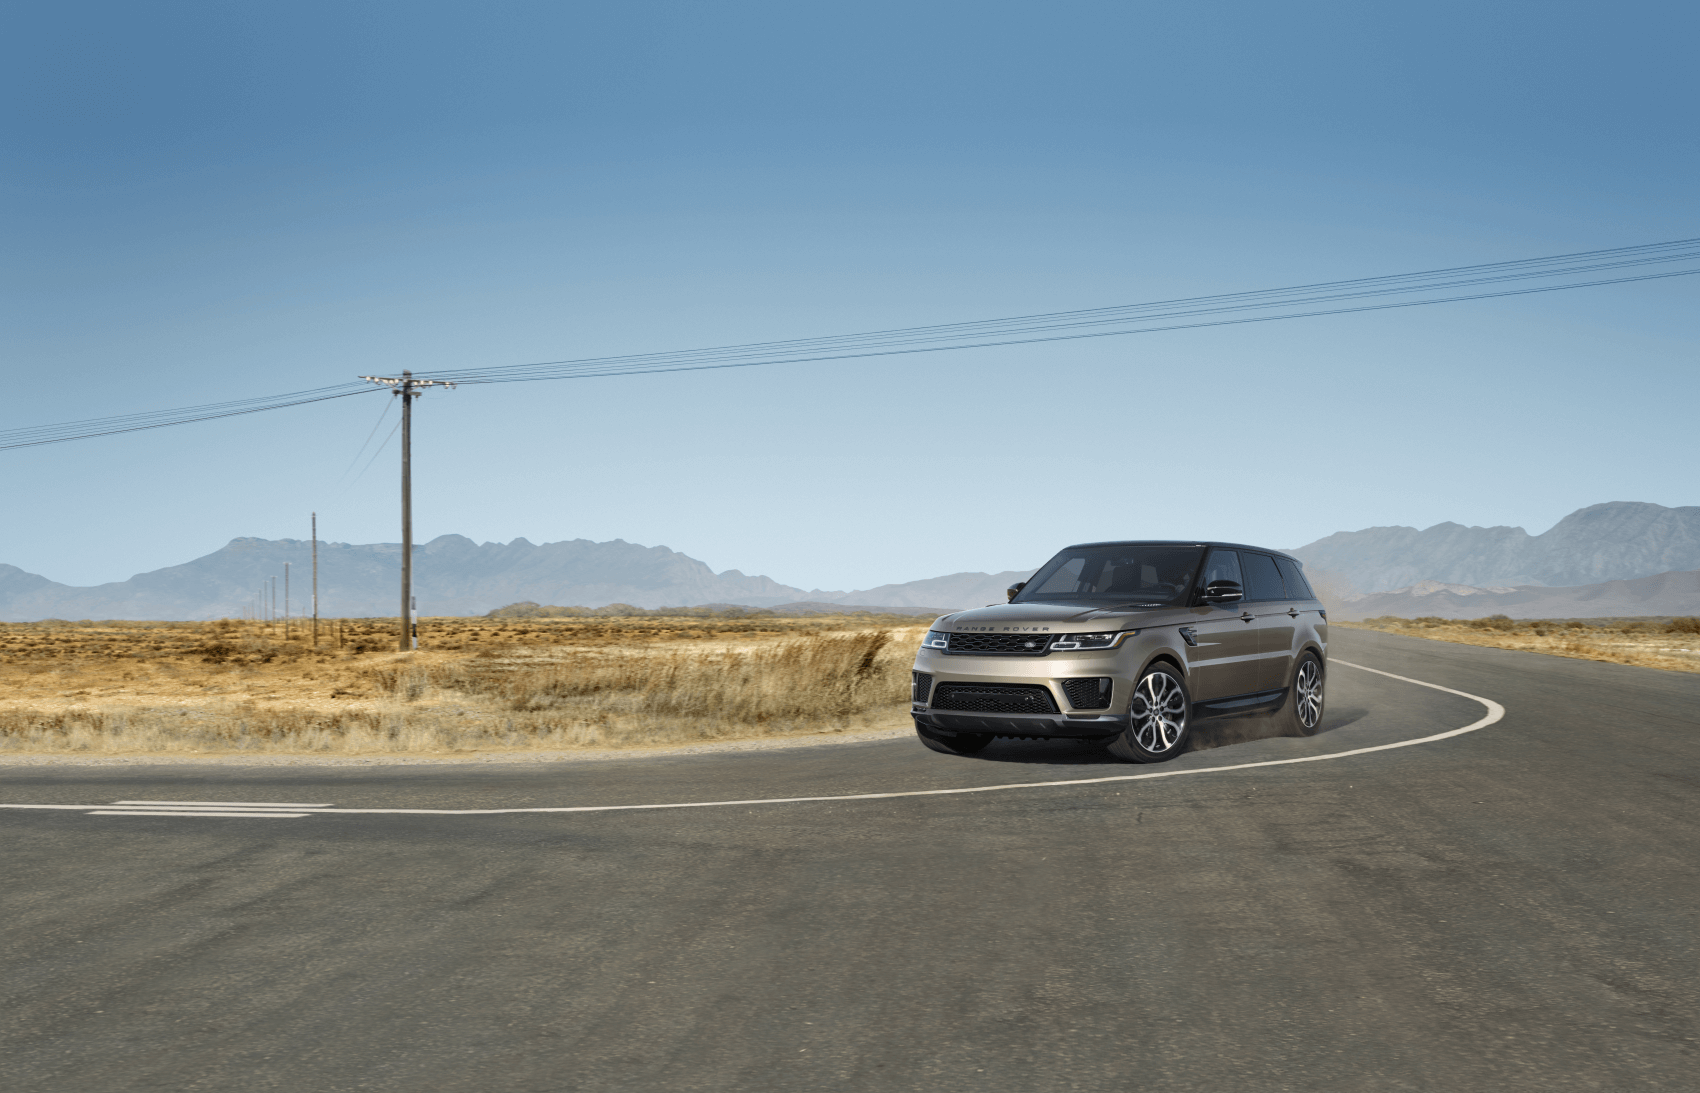 2021 Range Rover Sport Silver Highway Land Rover Colorado Springs